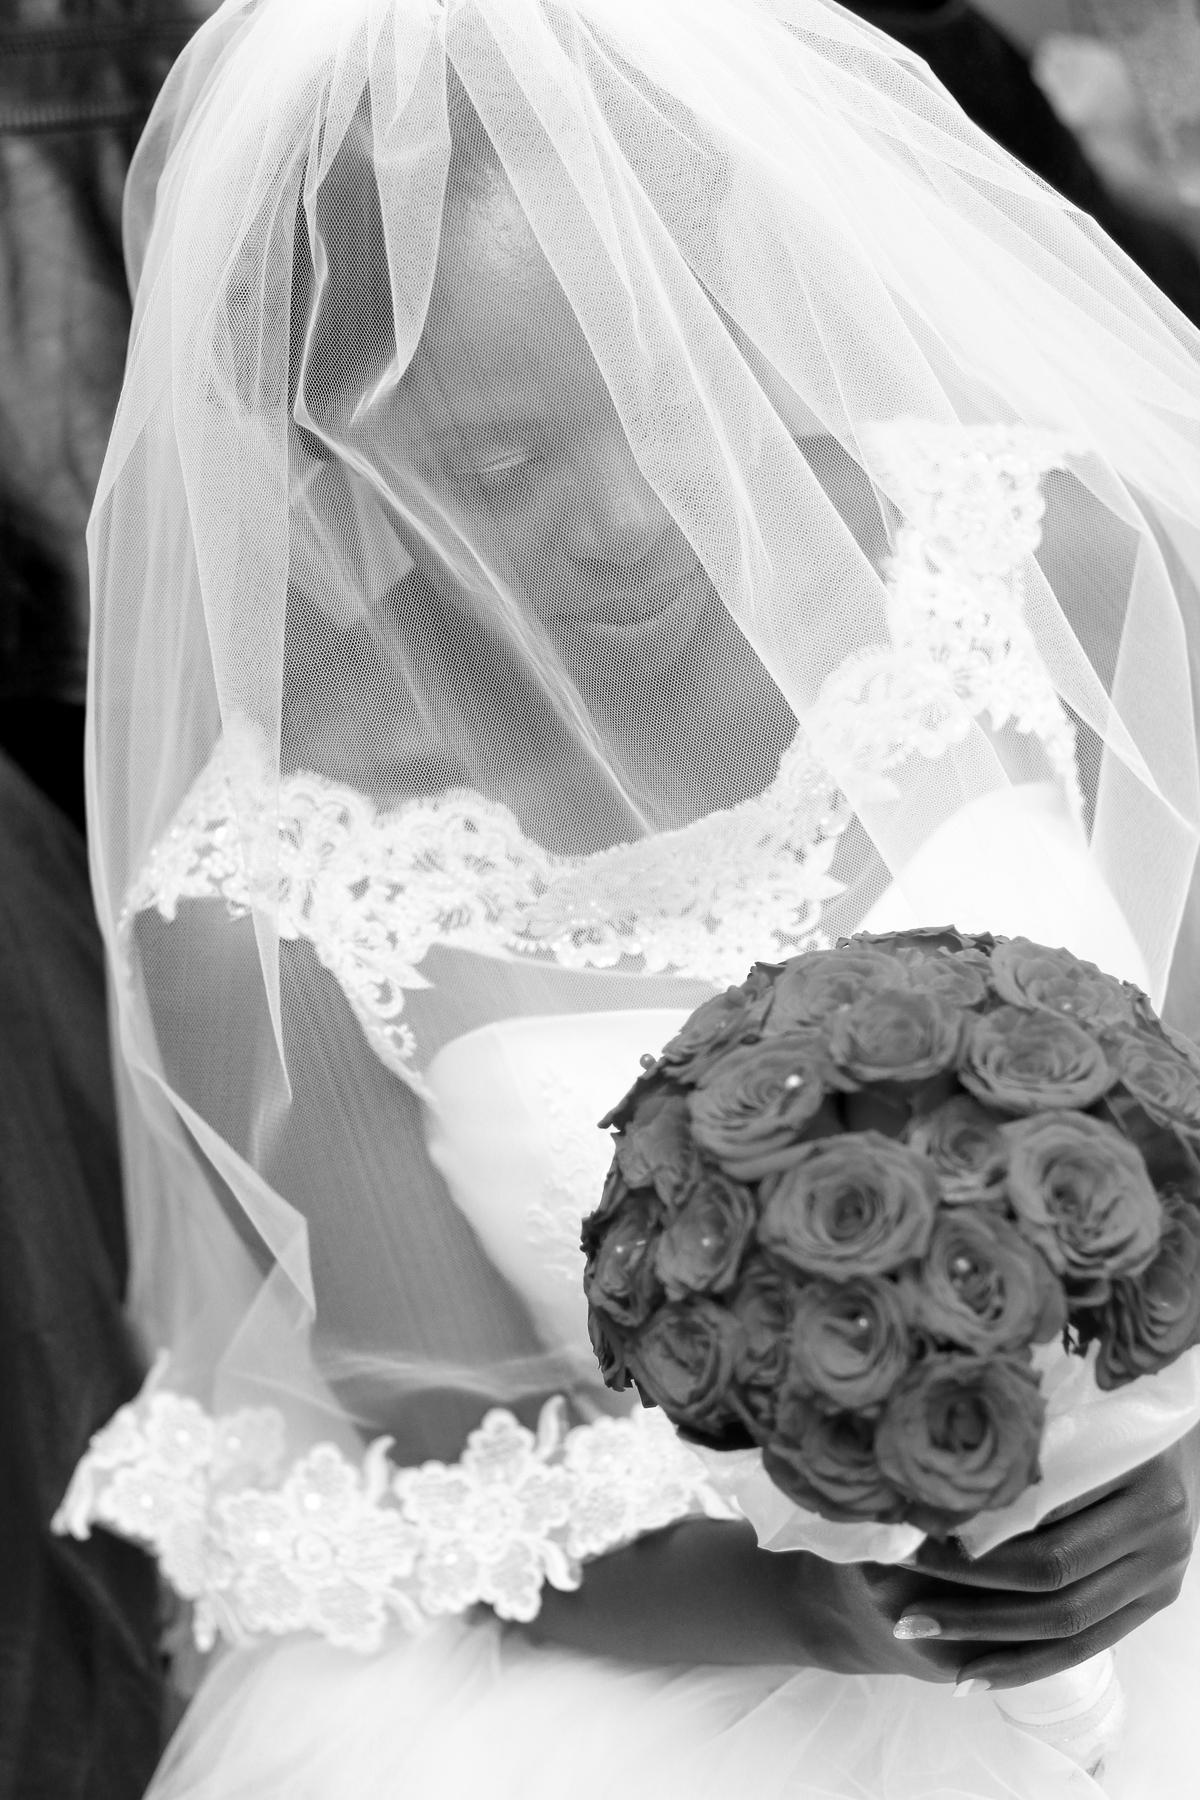 NAIROBI_KENYA_WEDDING_PHOTOGRAPHERS_ANTONY_TRIVET_PHOTOGRAPHYDari-Best Nairobi Weddings –Top Kenyan Wedding Photographers – Top Kenyan Weddings –Top Nairobi Wedding Photographers –Best Kenyan Wedding Photographers –Best Nairobi Wedding Photography